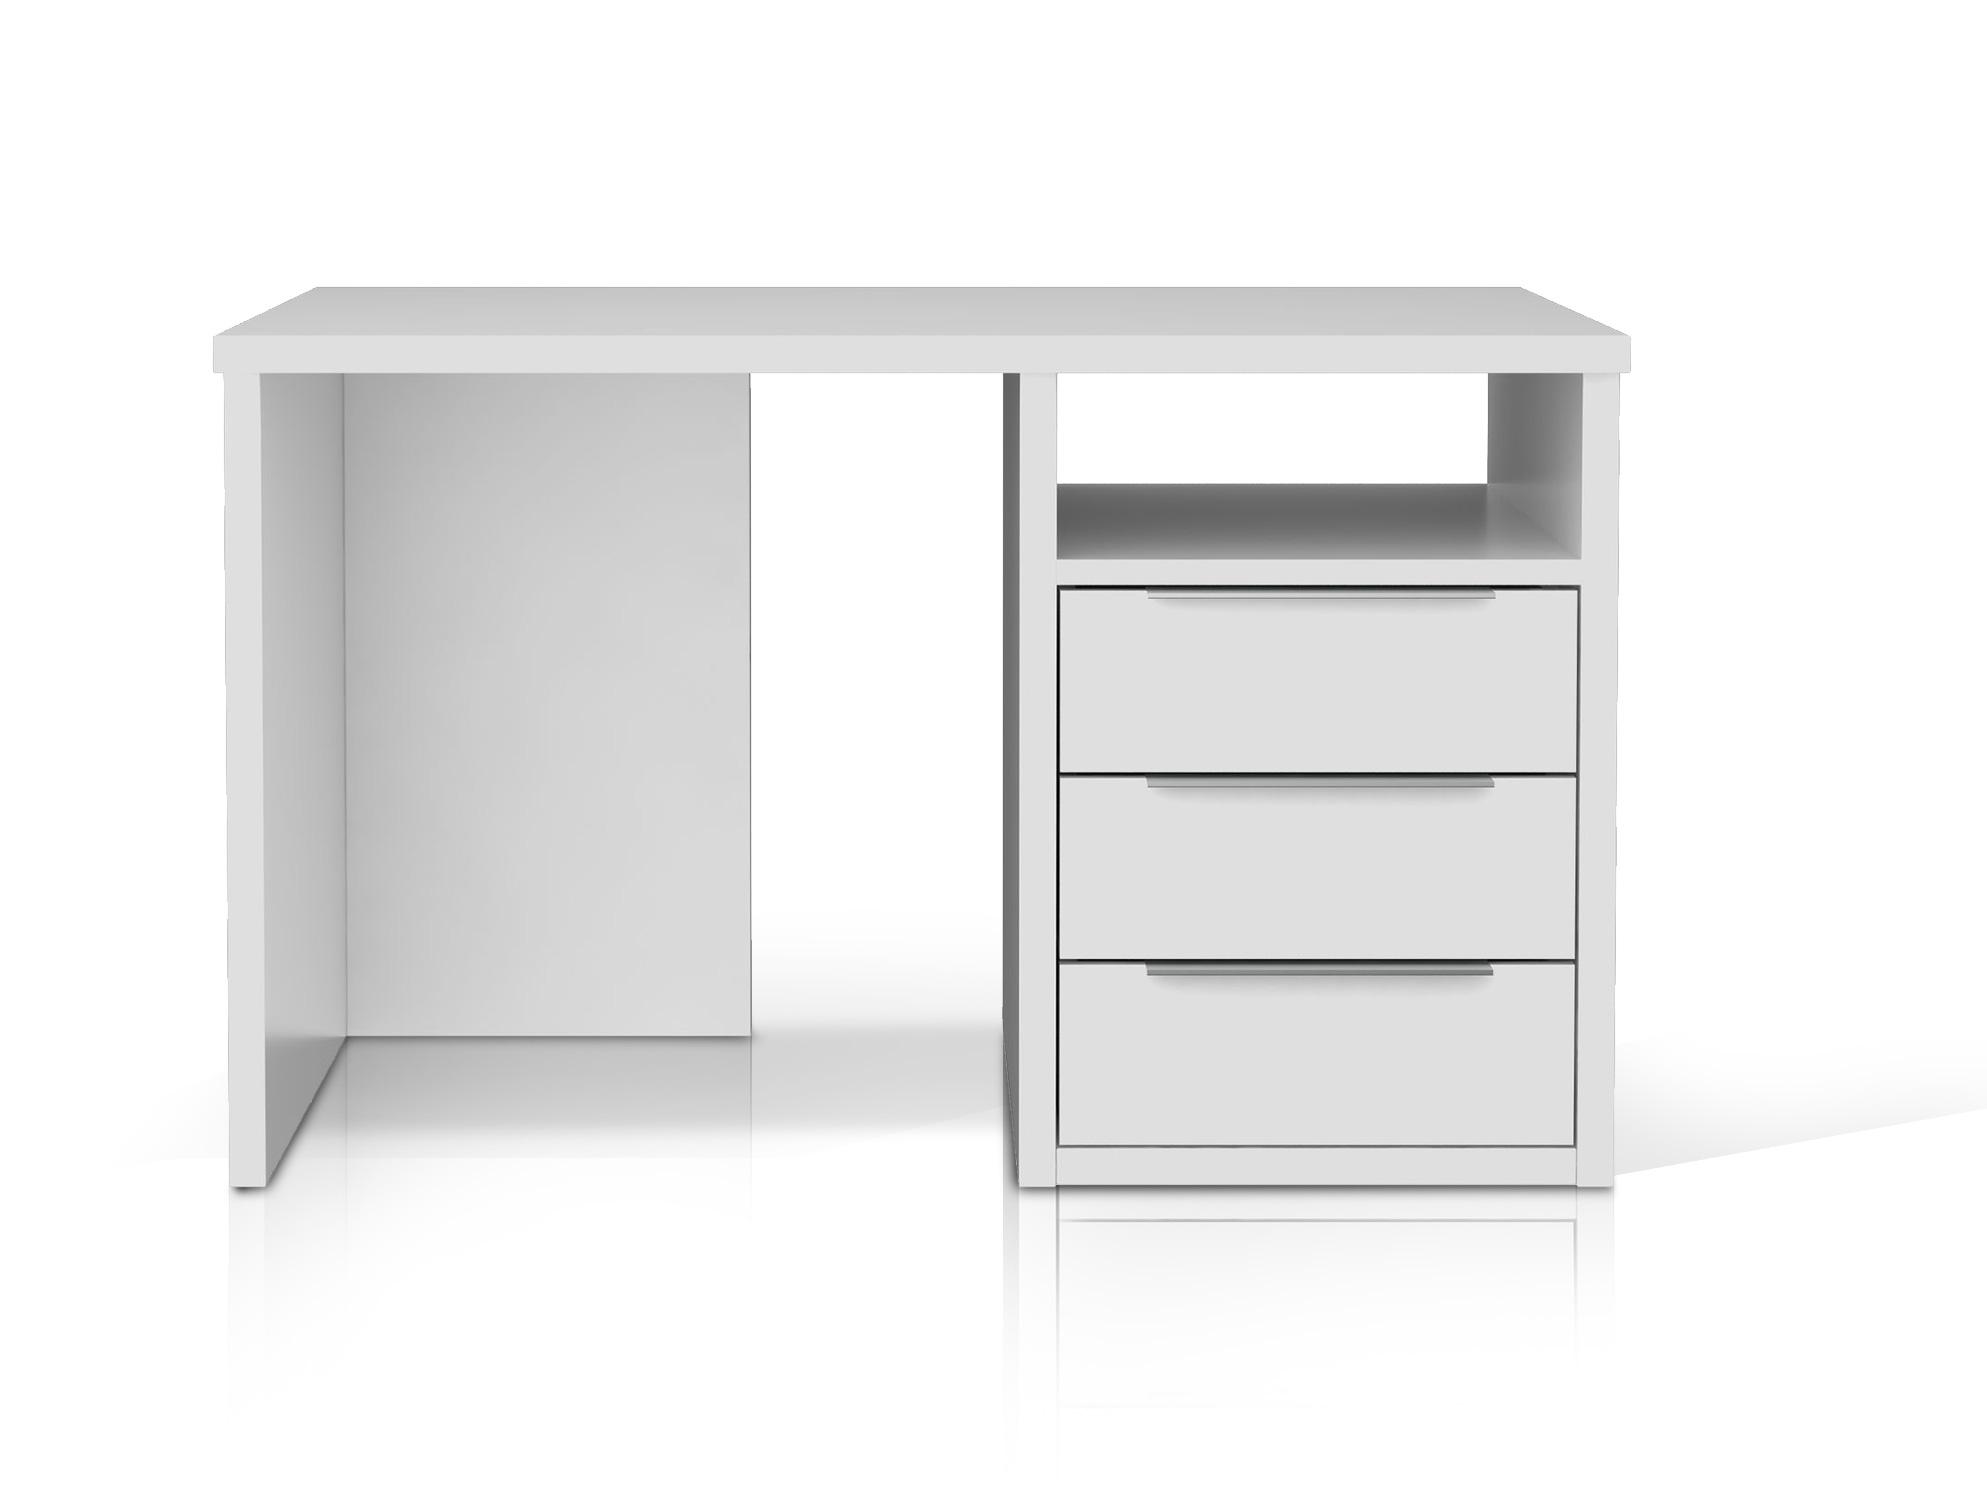 orca schreibtisch 120 cm schubladen rechts weiss. Black Bedroom Furniture Sets. Home Design Ideas